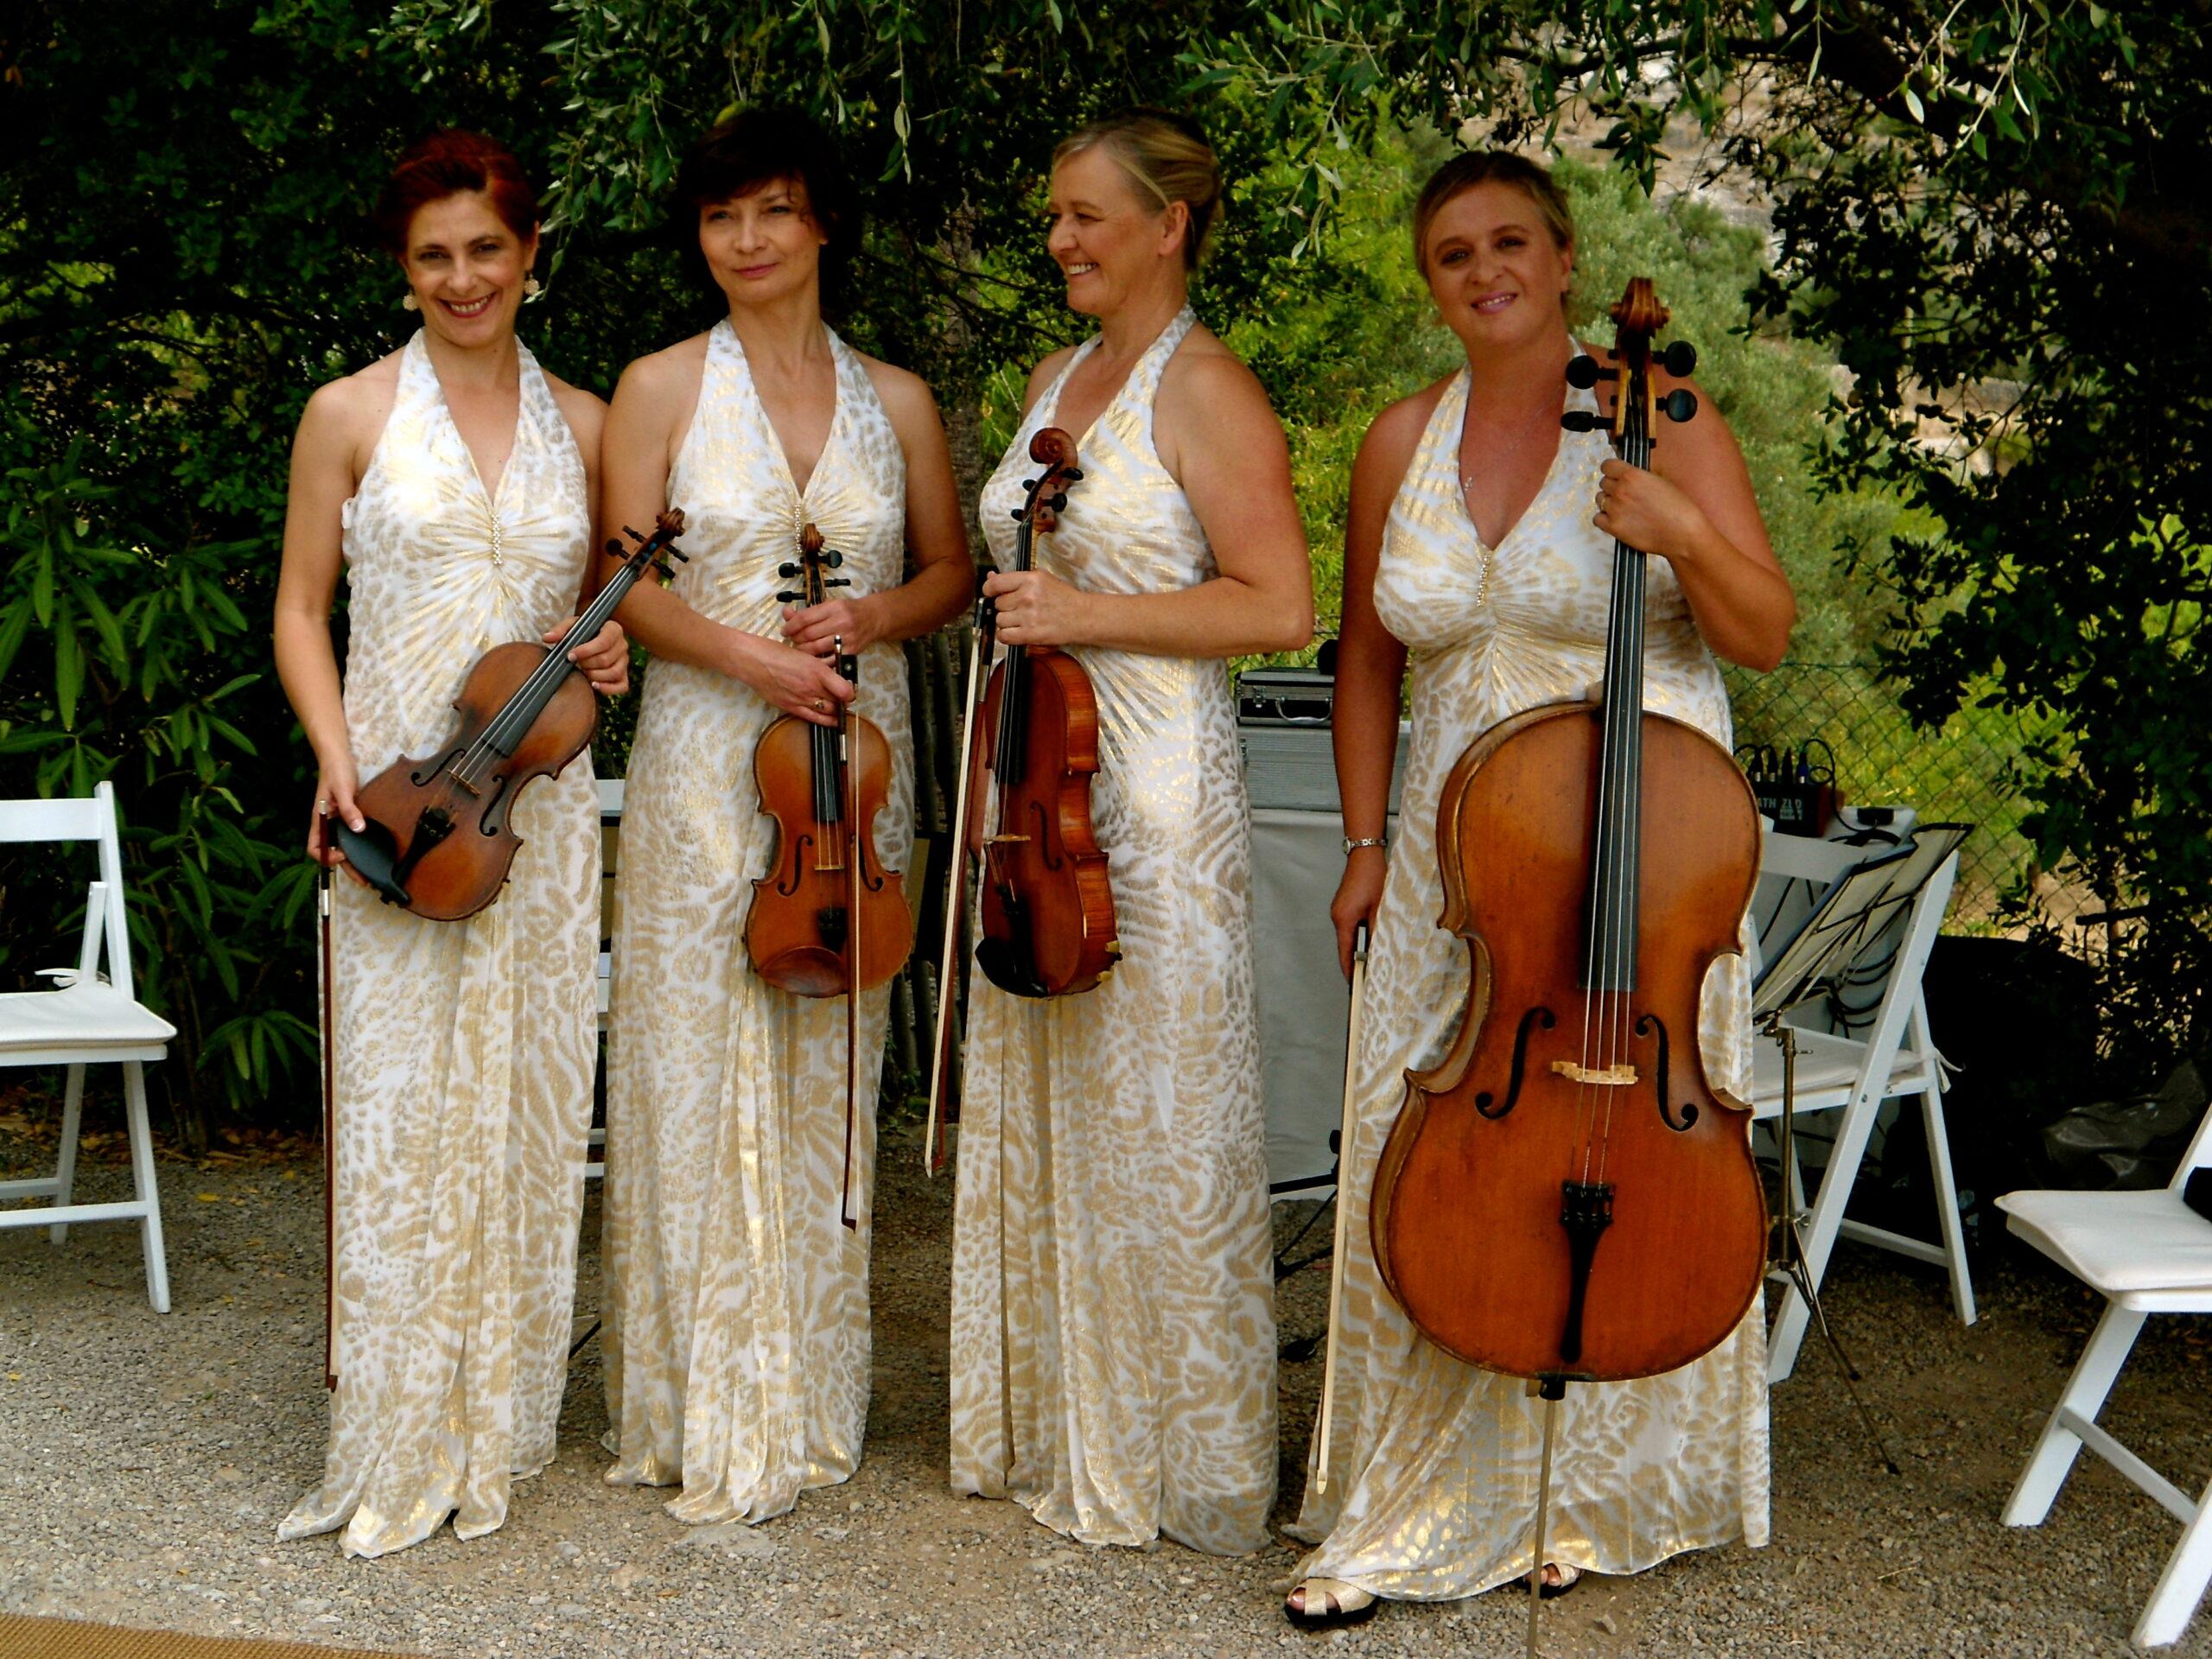 Soriana Ivaniv, wedding violinist in Mallorca (left) alongside other musicians